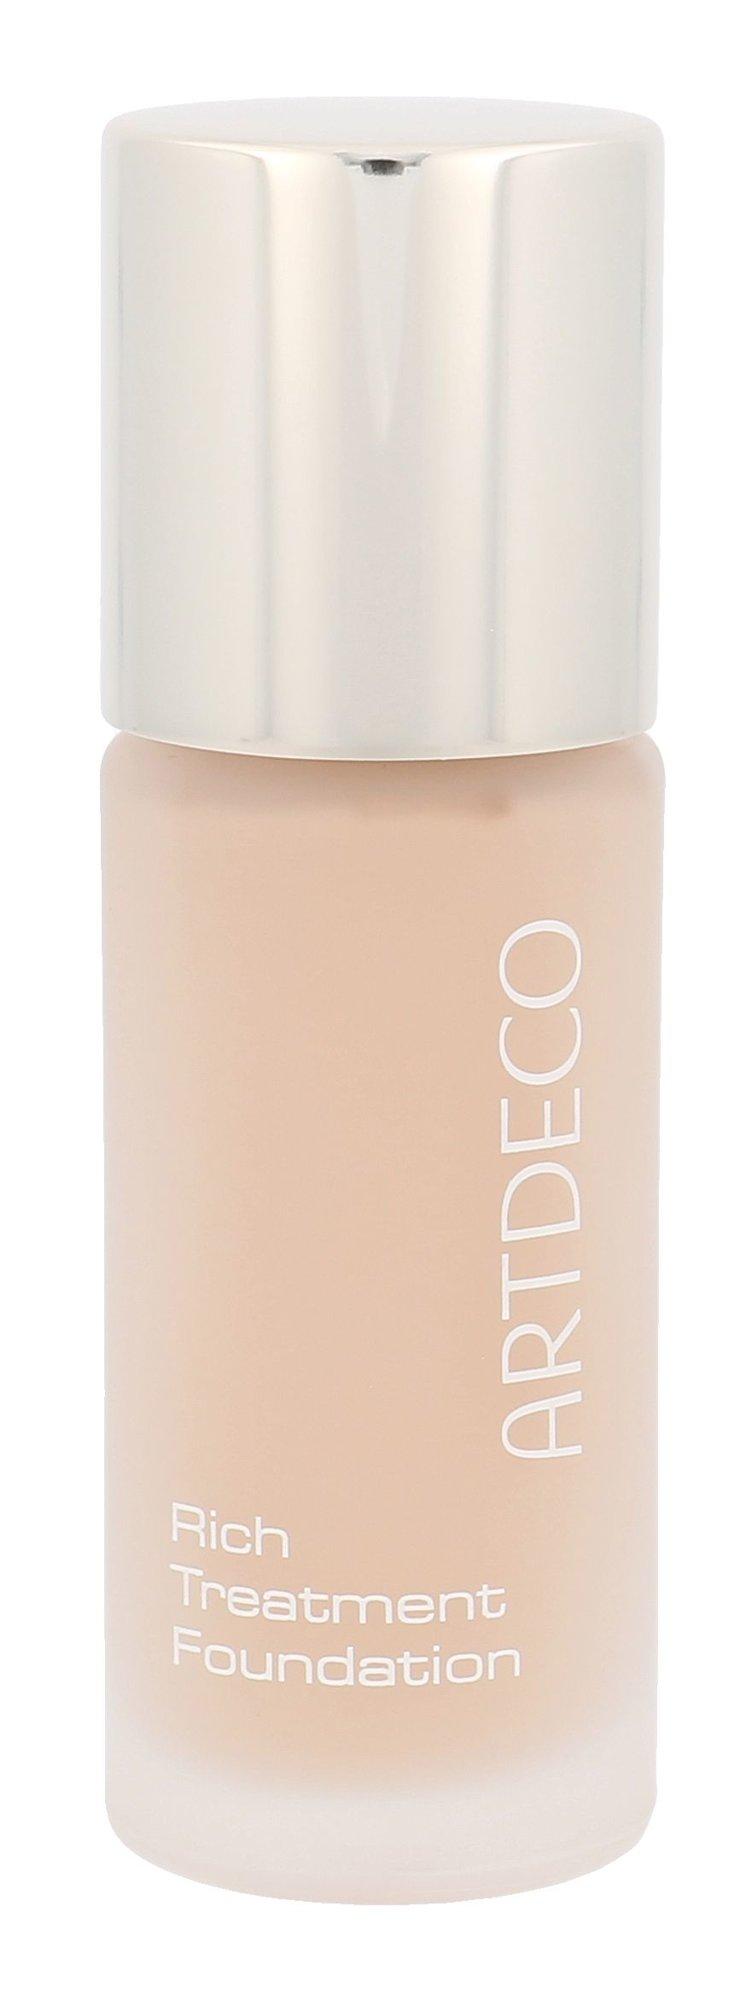 Artdeco Rich Treatment Cosmetic 20ml 28 Light Porcelain